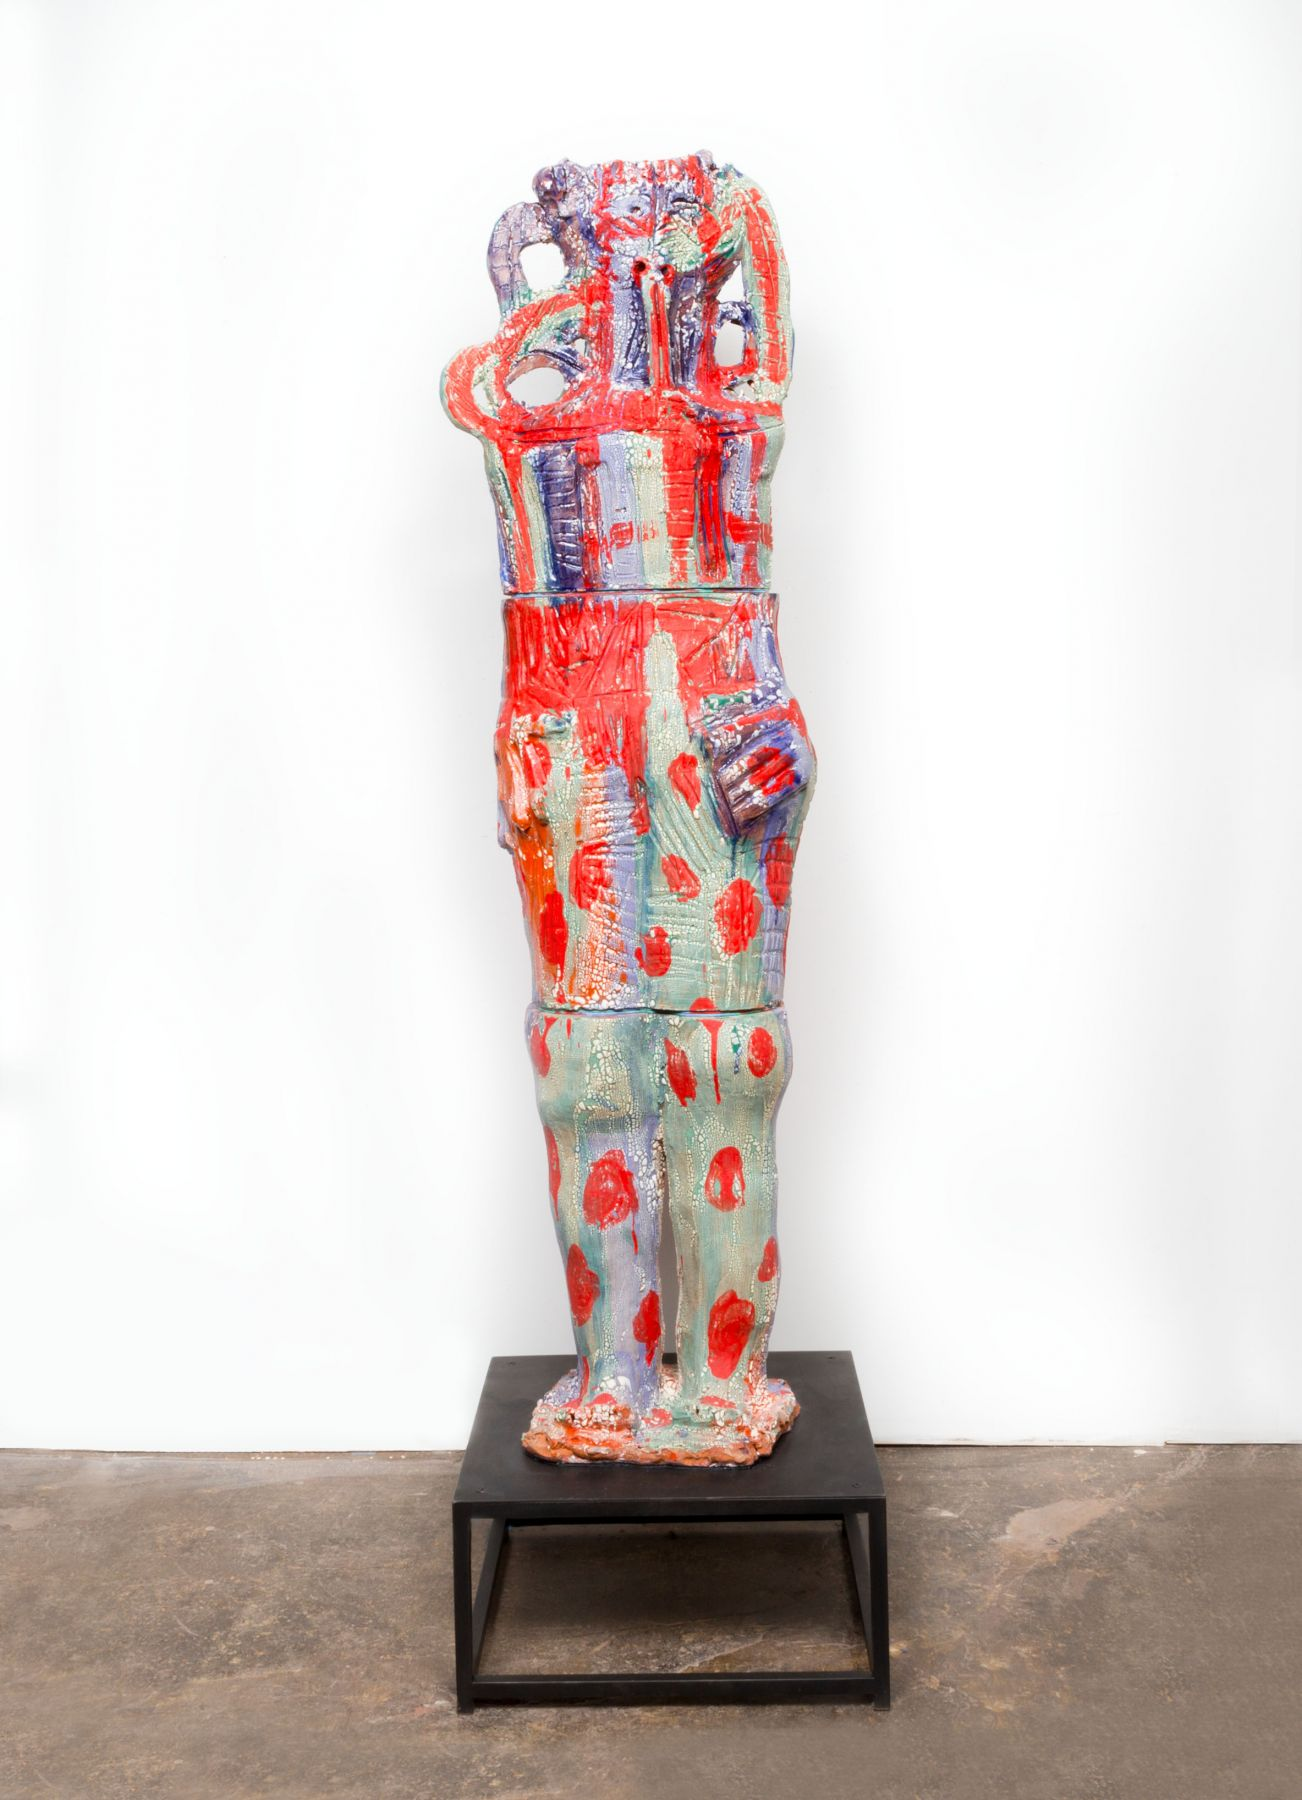 a ceramic sculpture by william j. o'brien in a nyc contemporary art gallery